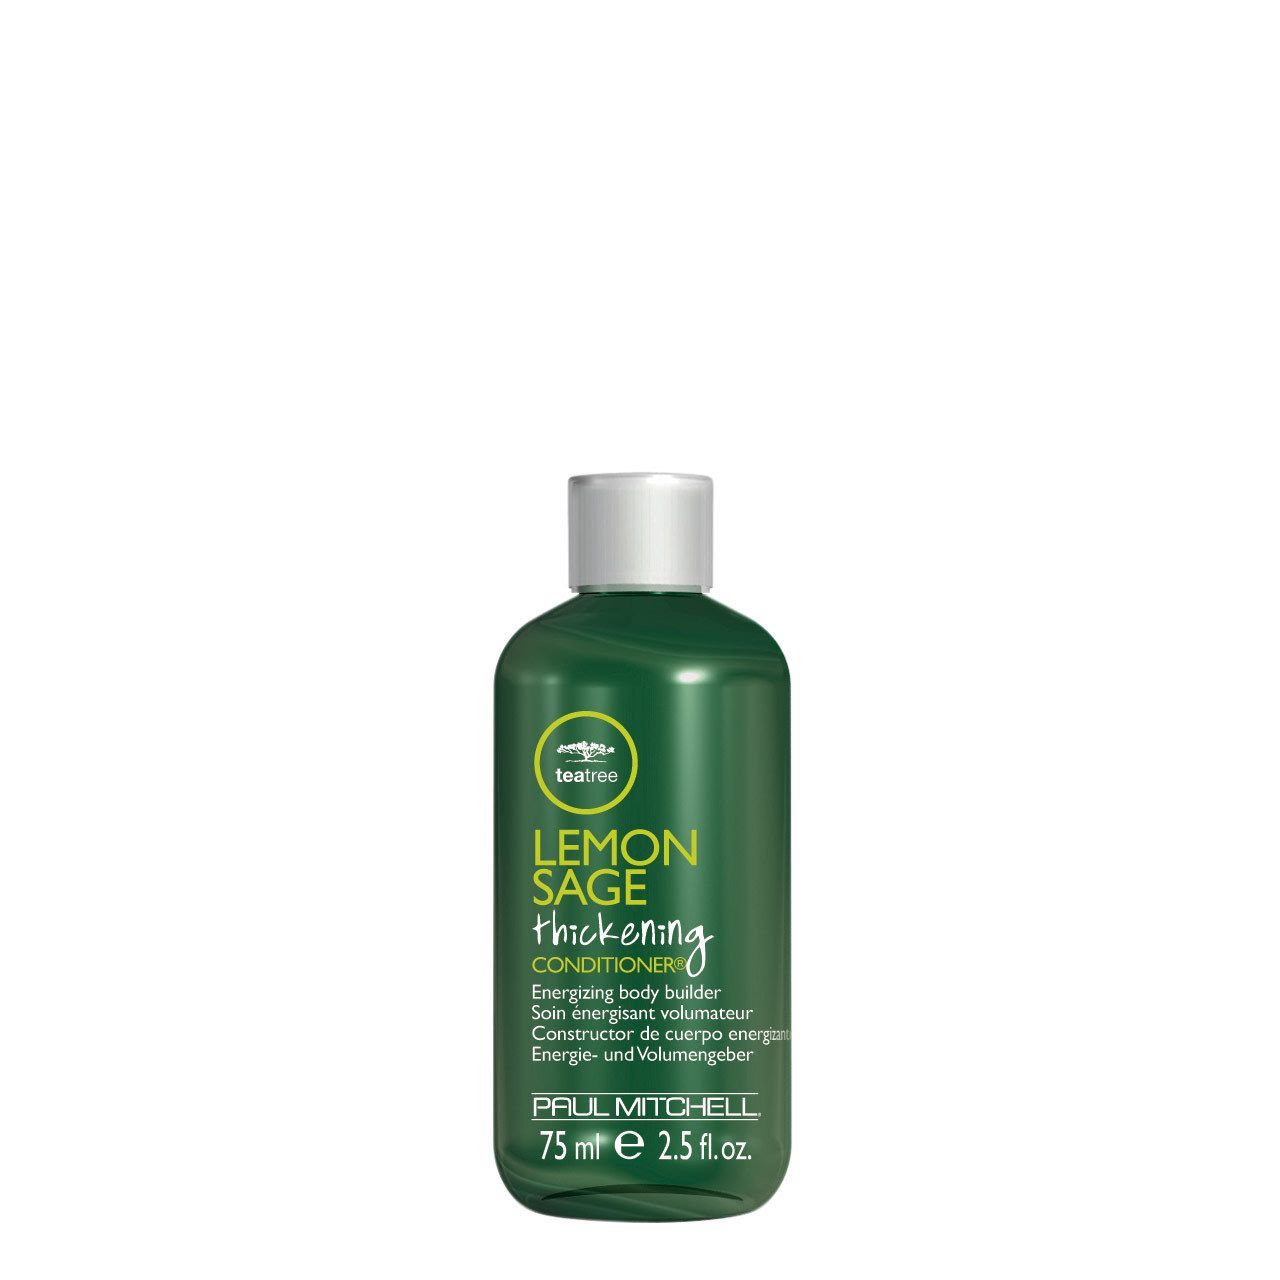 Paul Mitchell Tea Tree Lemon Sage Thickening Spray - 75ml